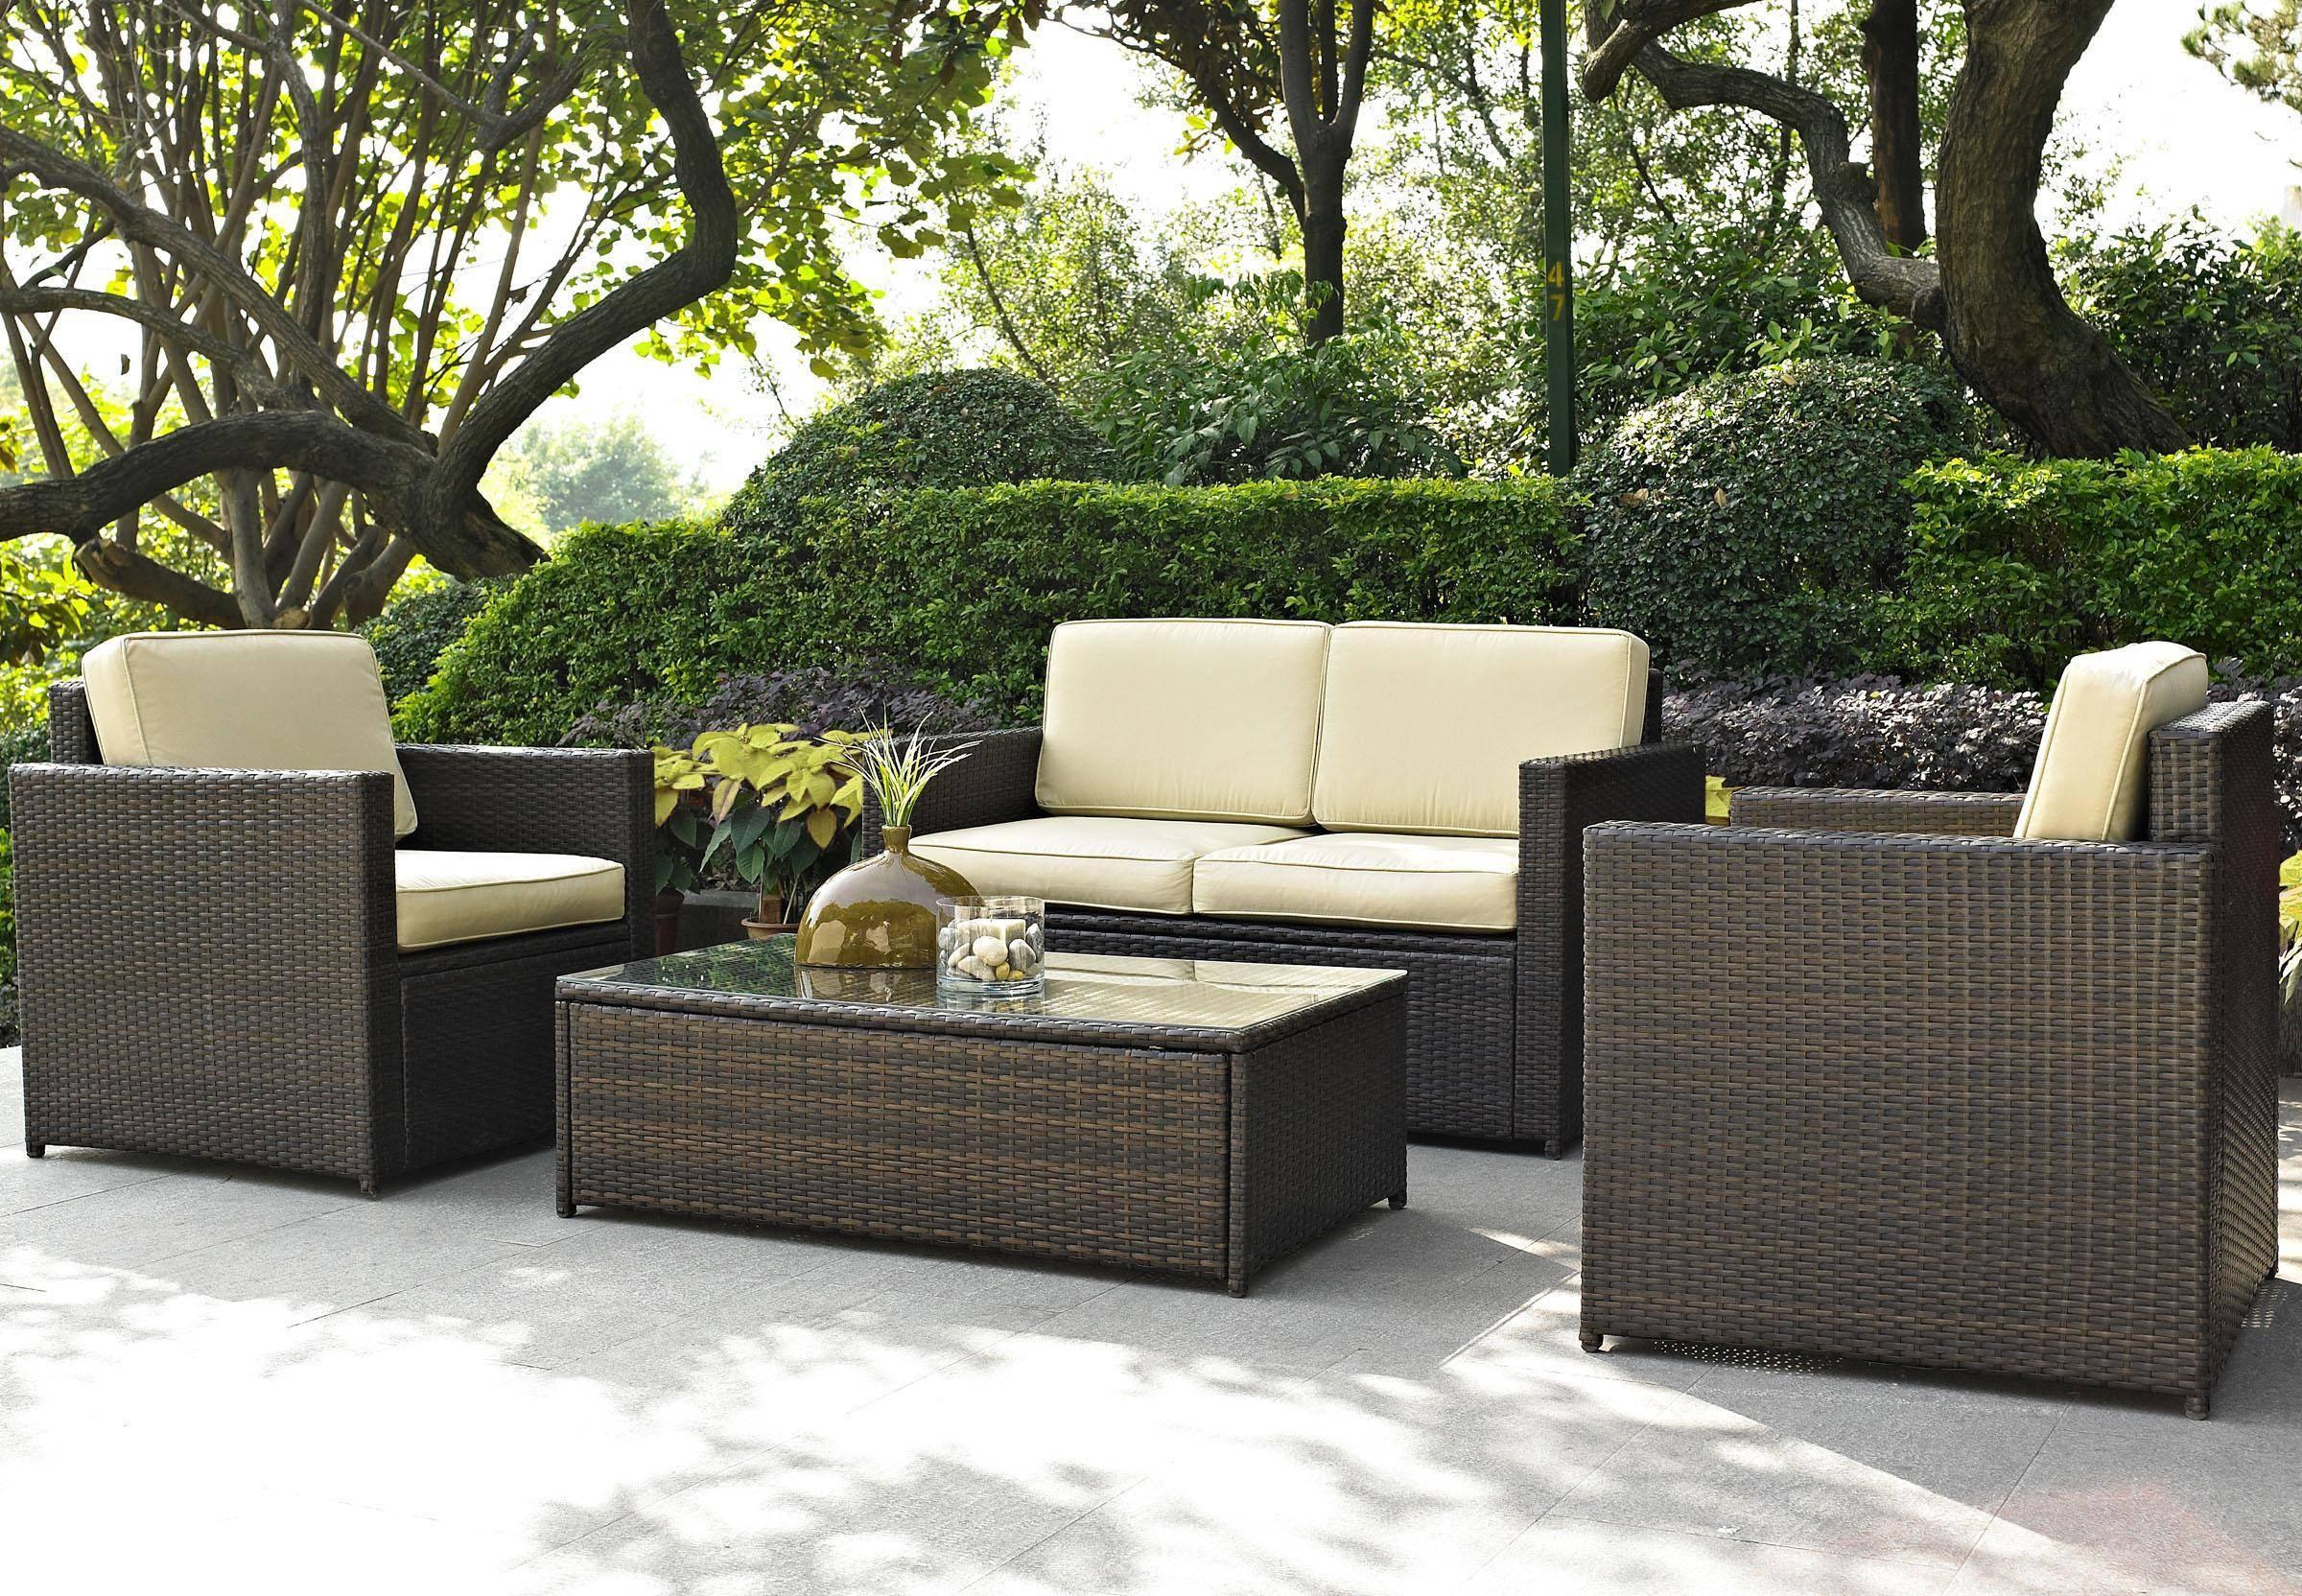 Furniture: Enchanting Deck Design With Elegant Black Wicker Throughout Black Wicker Sofas (View 8 of 15)